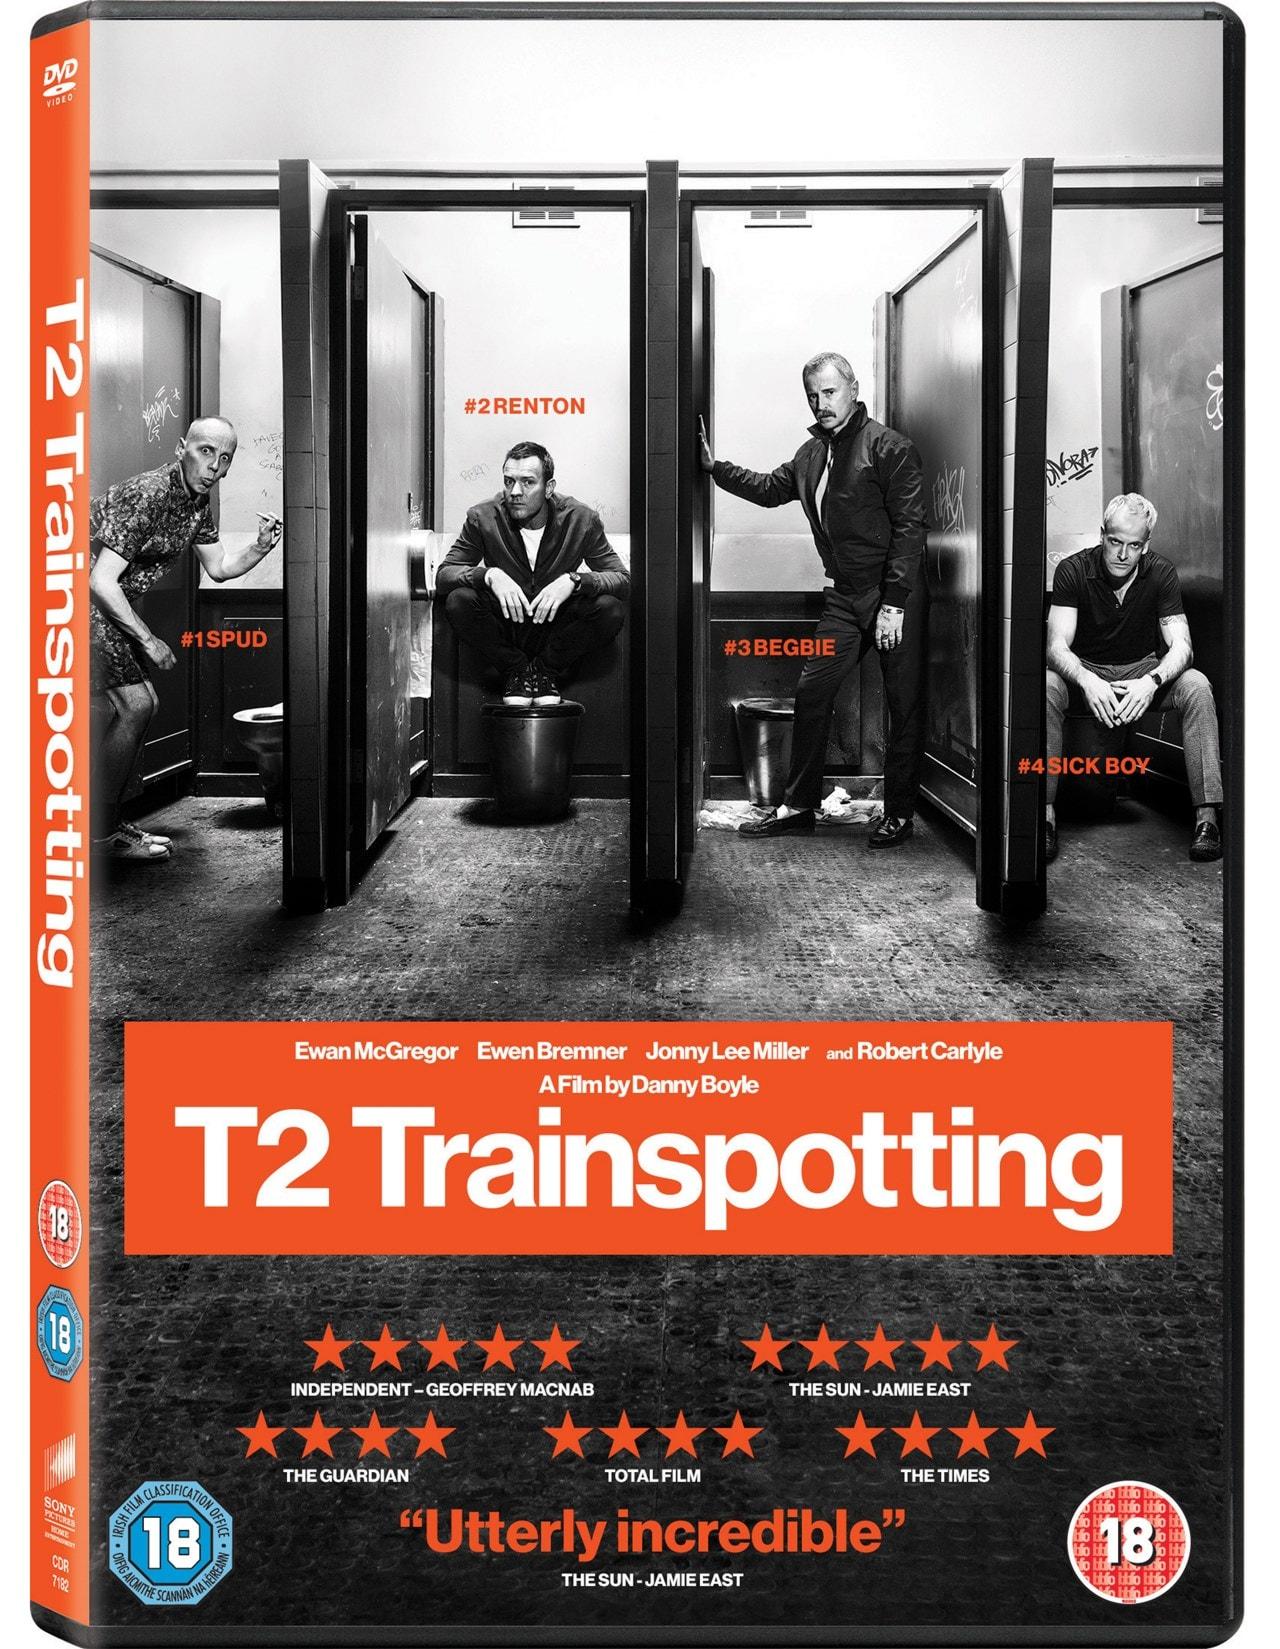 T2 Trainspotting - 2